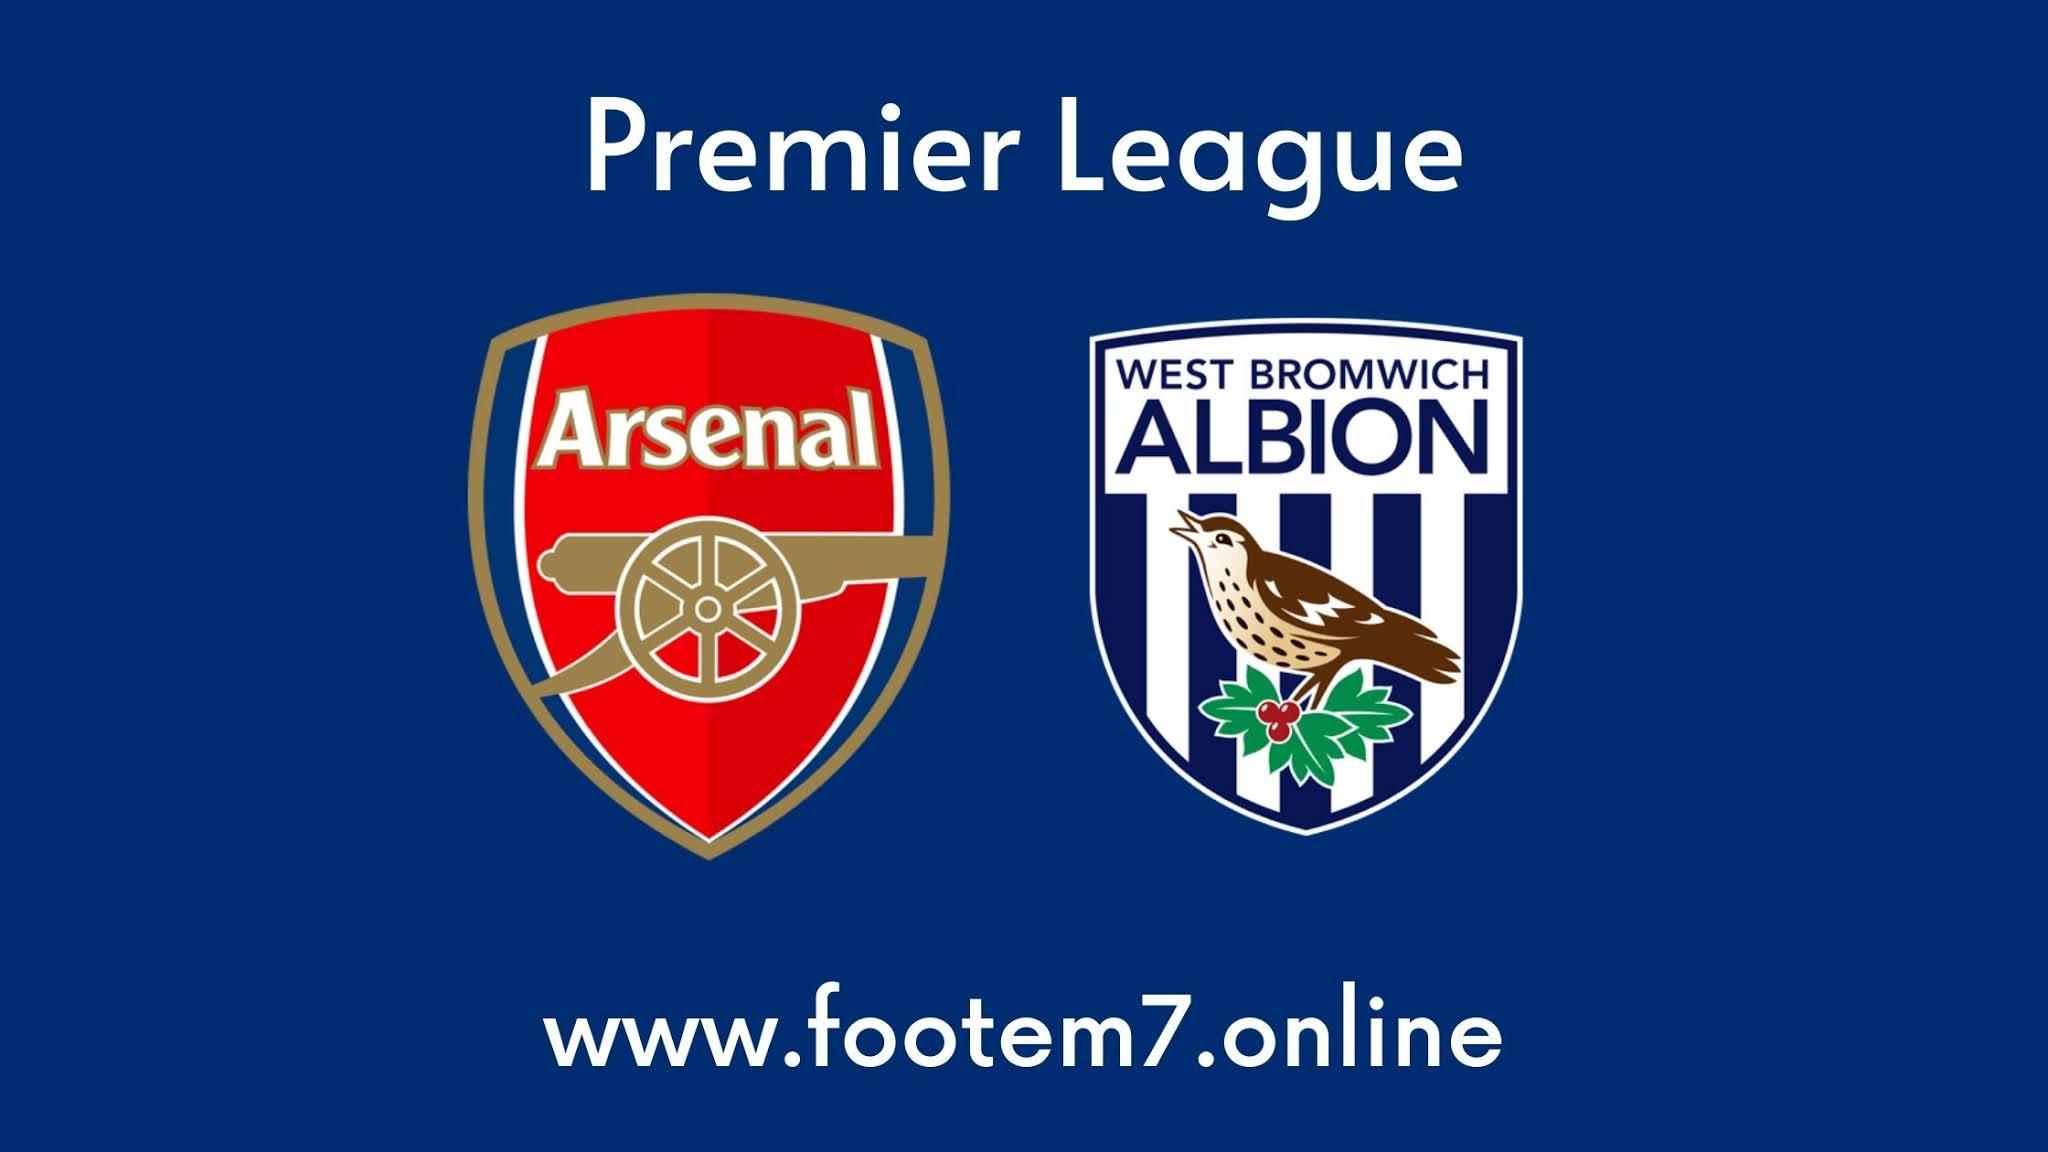 Arsenal vs West Brom